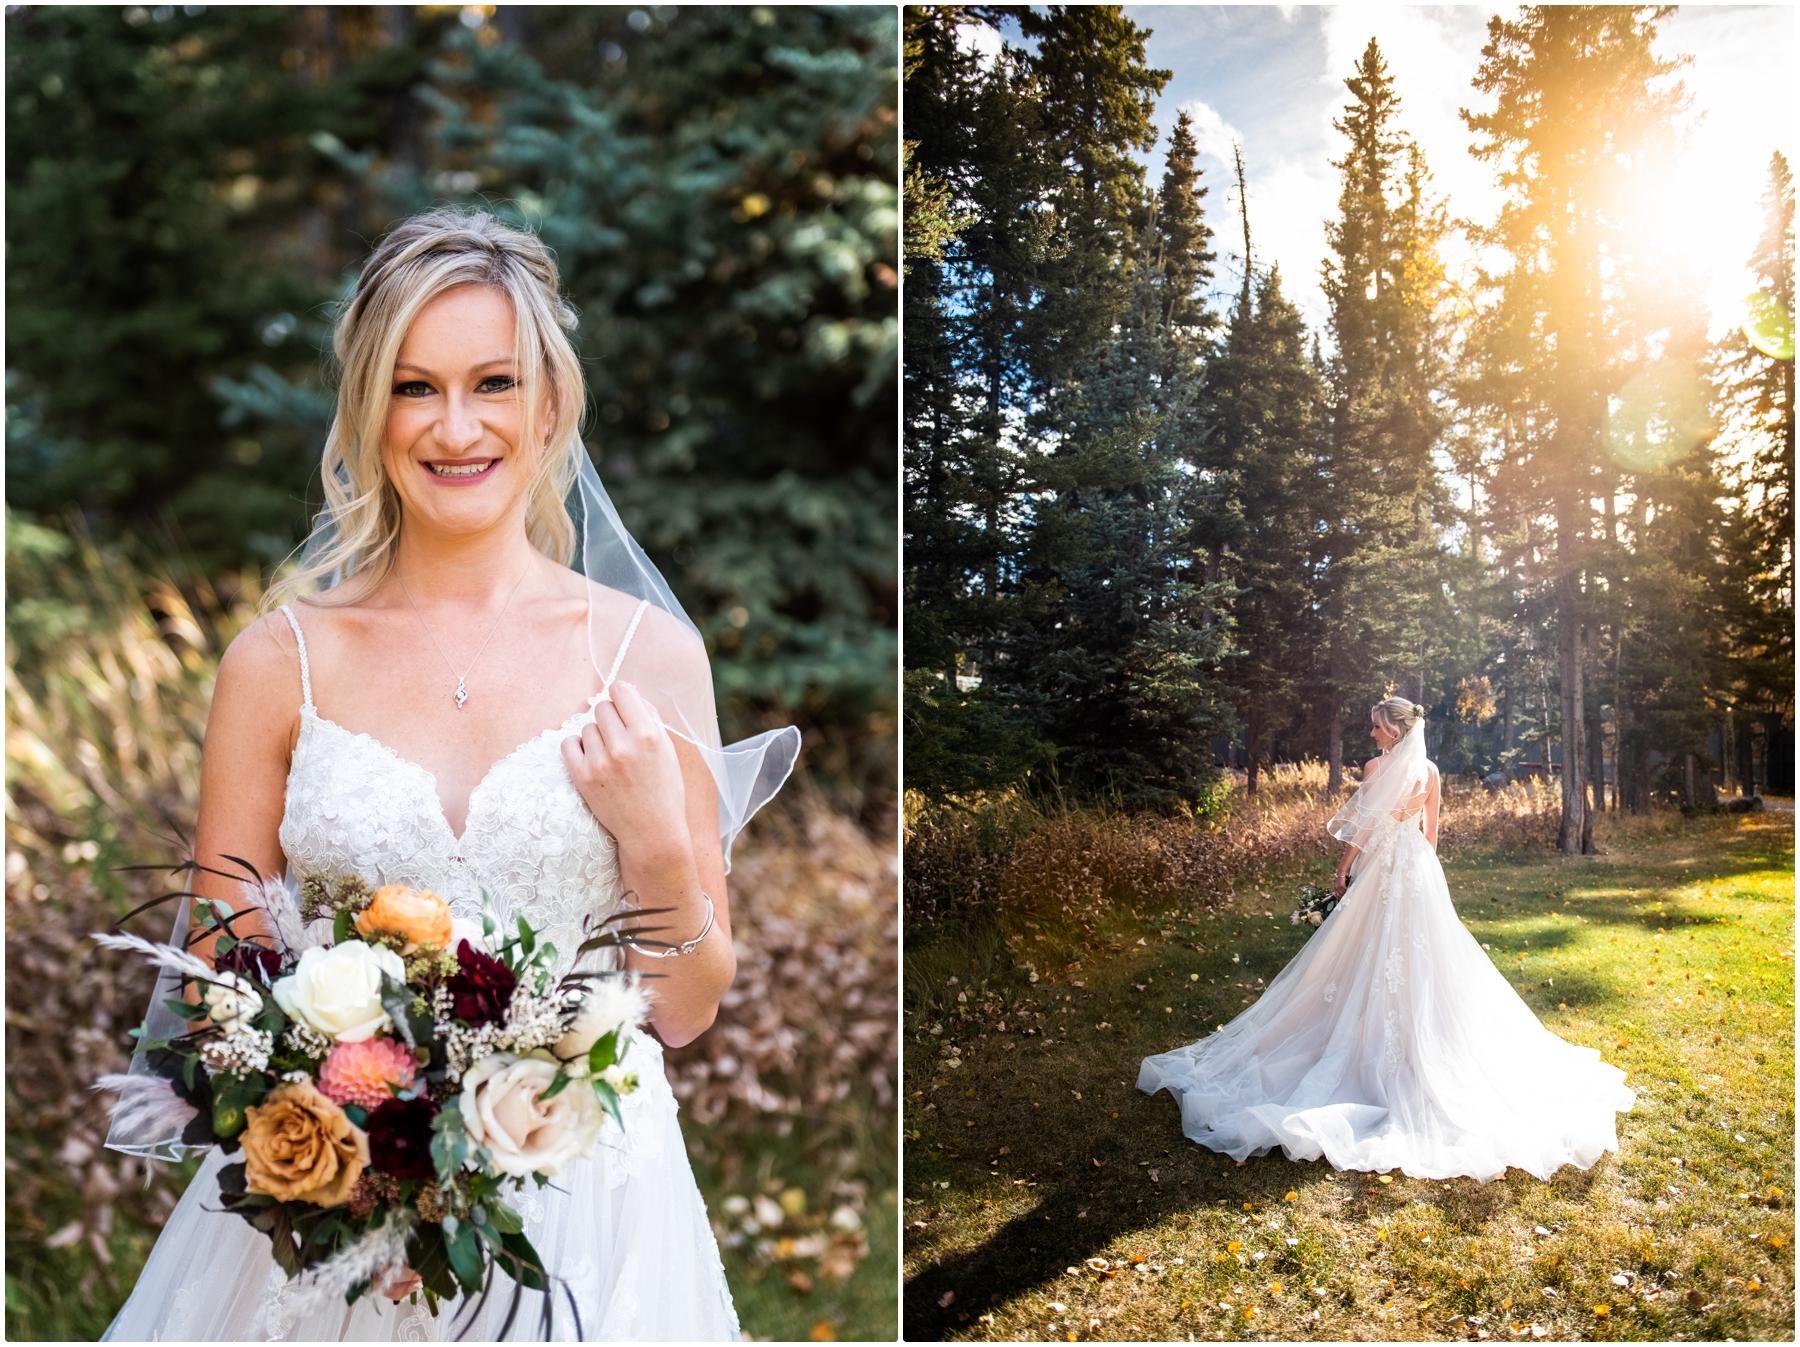 Autumn Azuridge Estate Hotel Bridal Portraits - Azuridge Estate Hotel Wedding